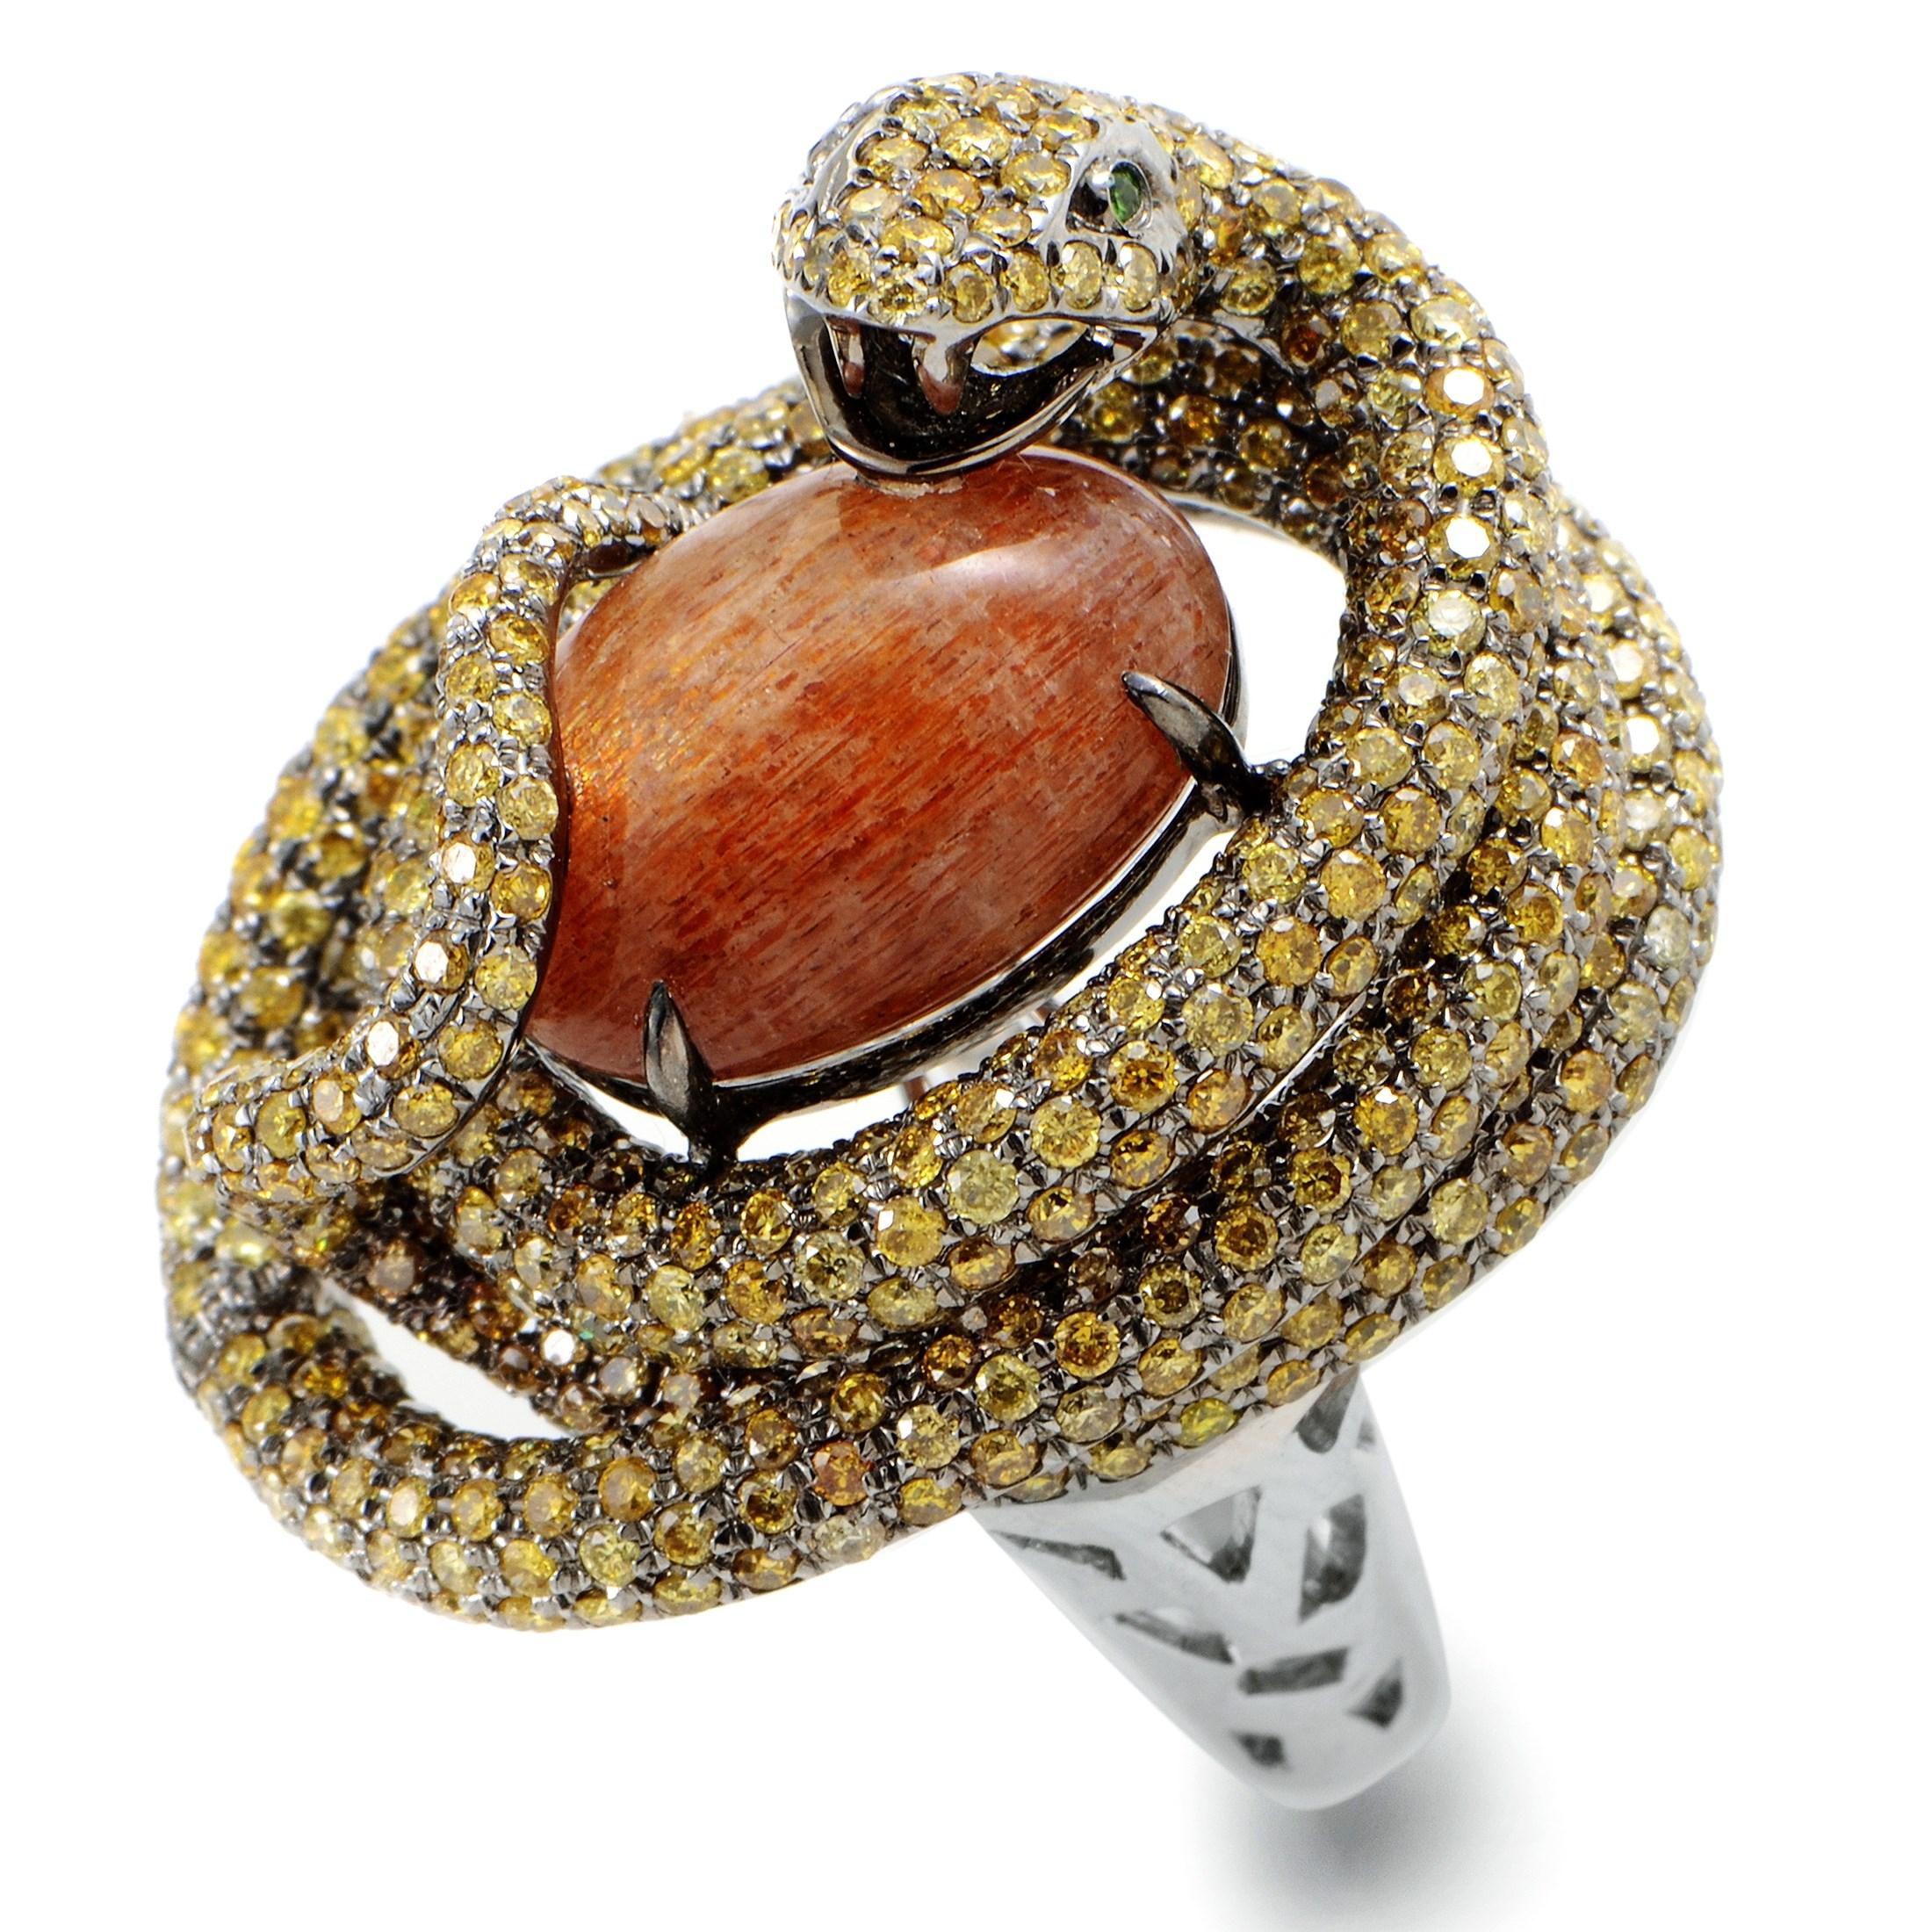 18K White Gold Sun Stone Ring 21457411W/BR